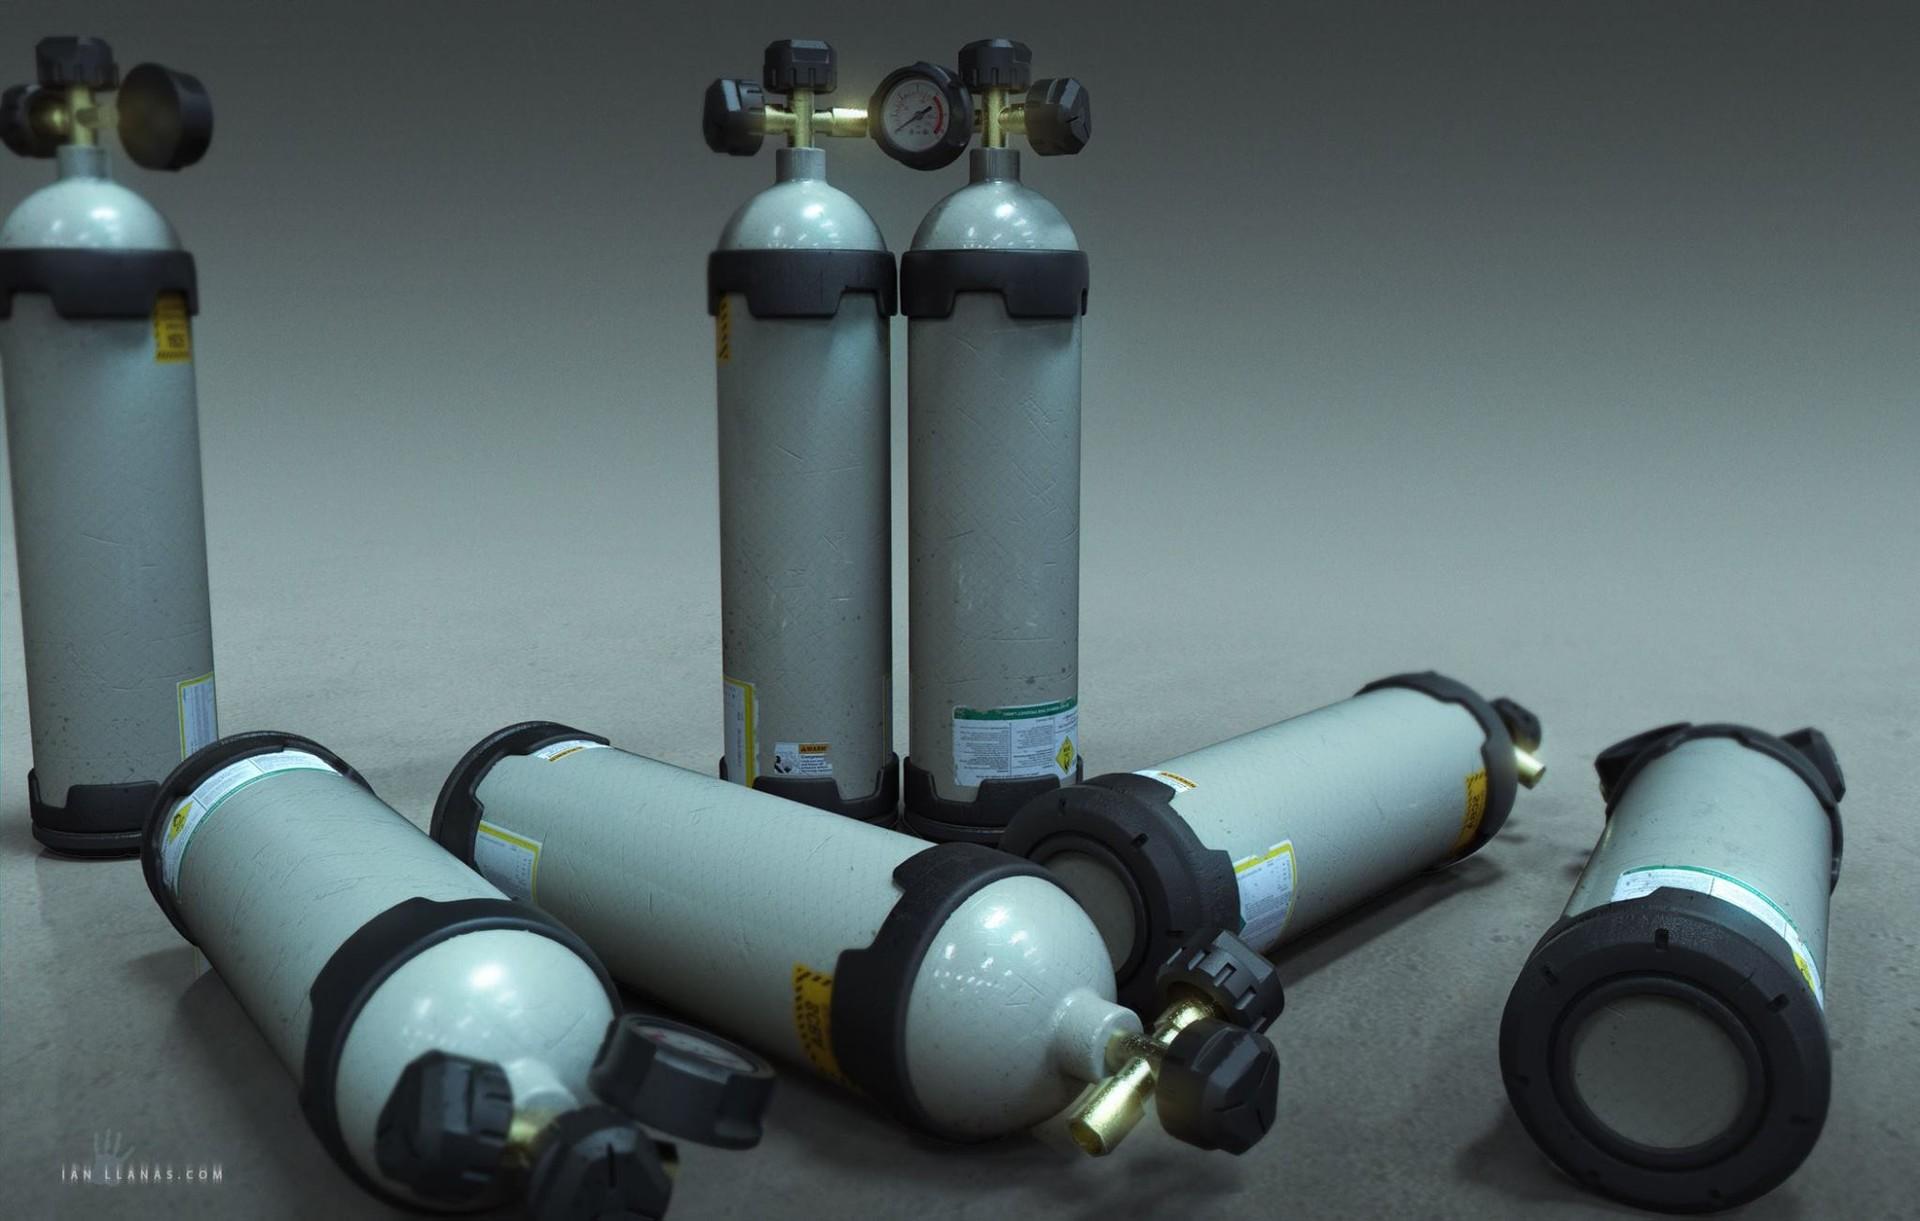 The oxygen tanks